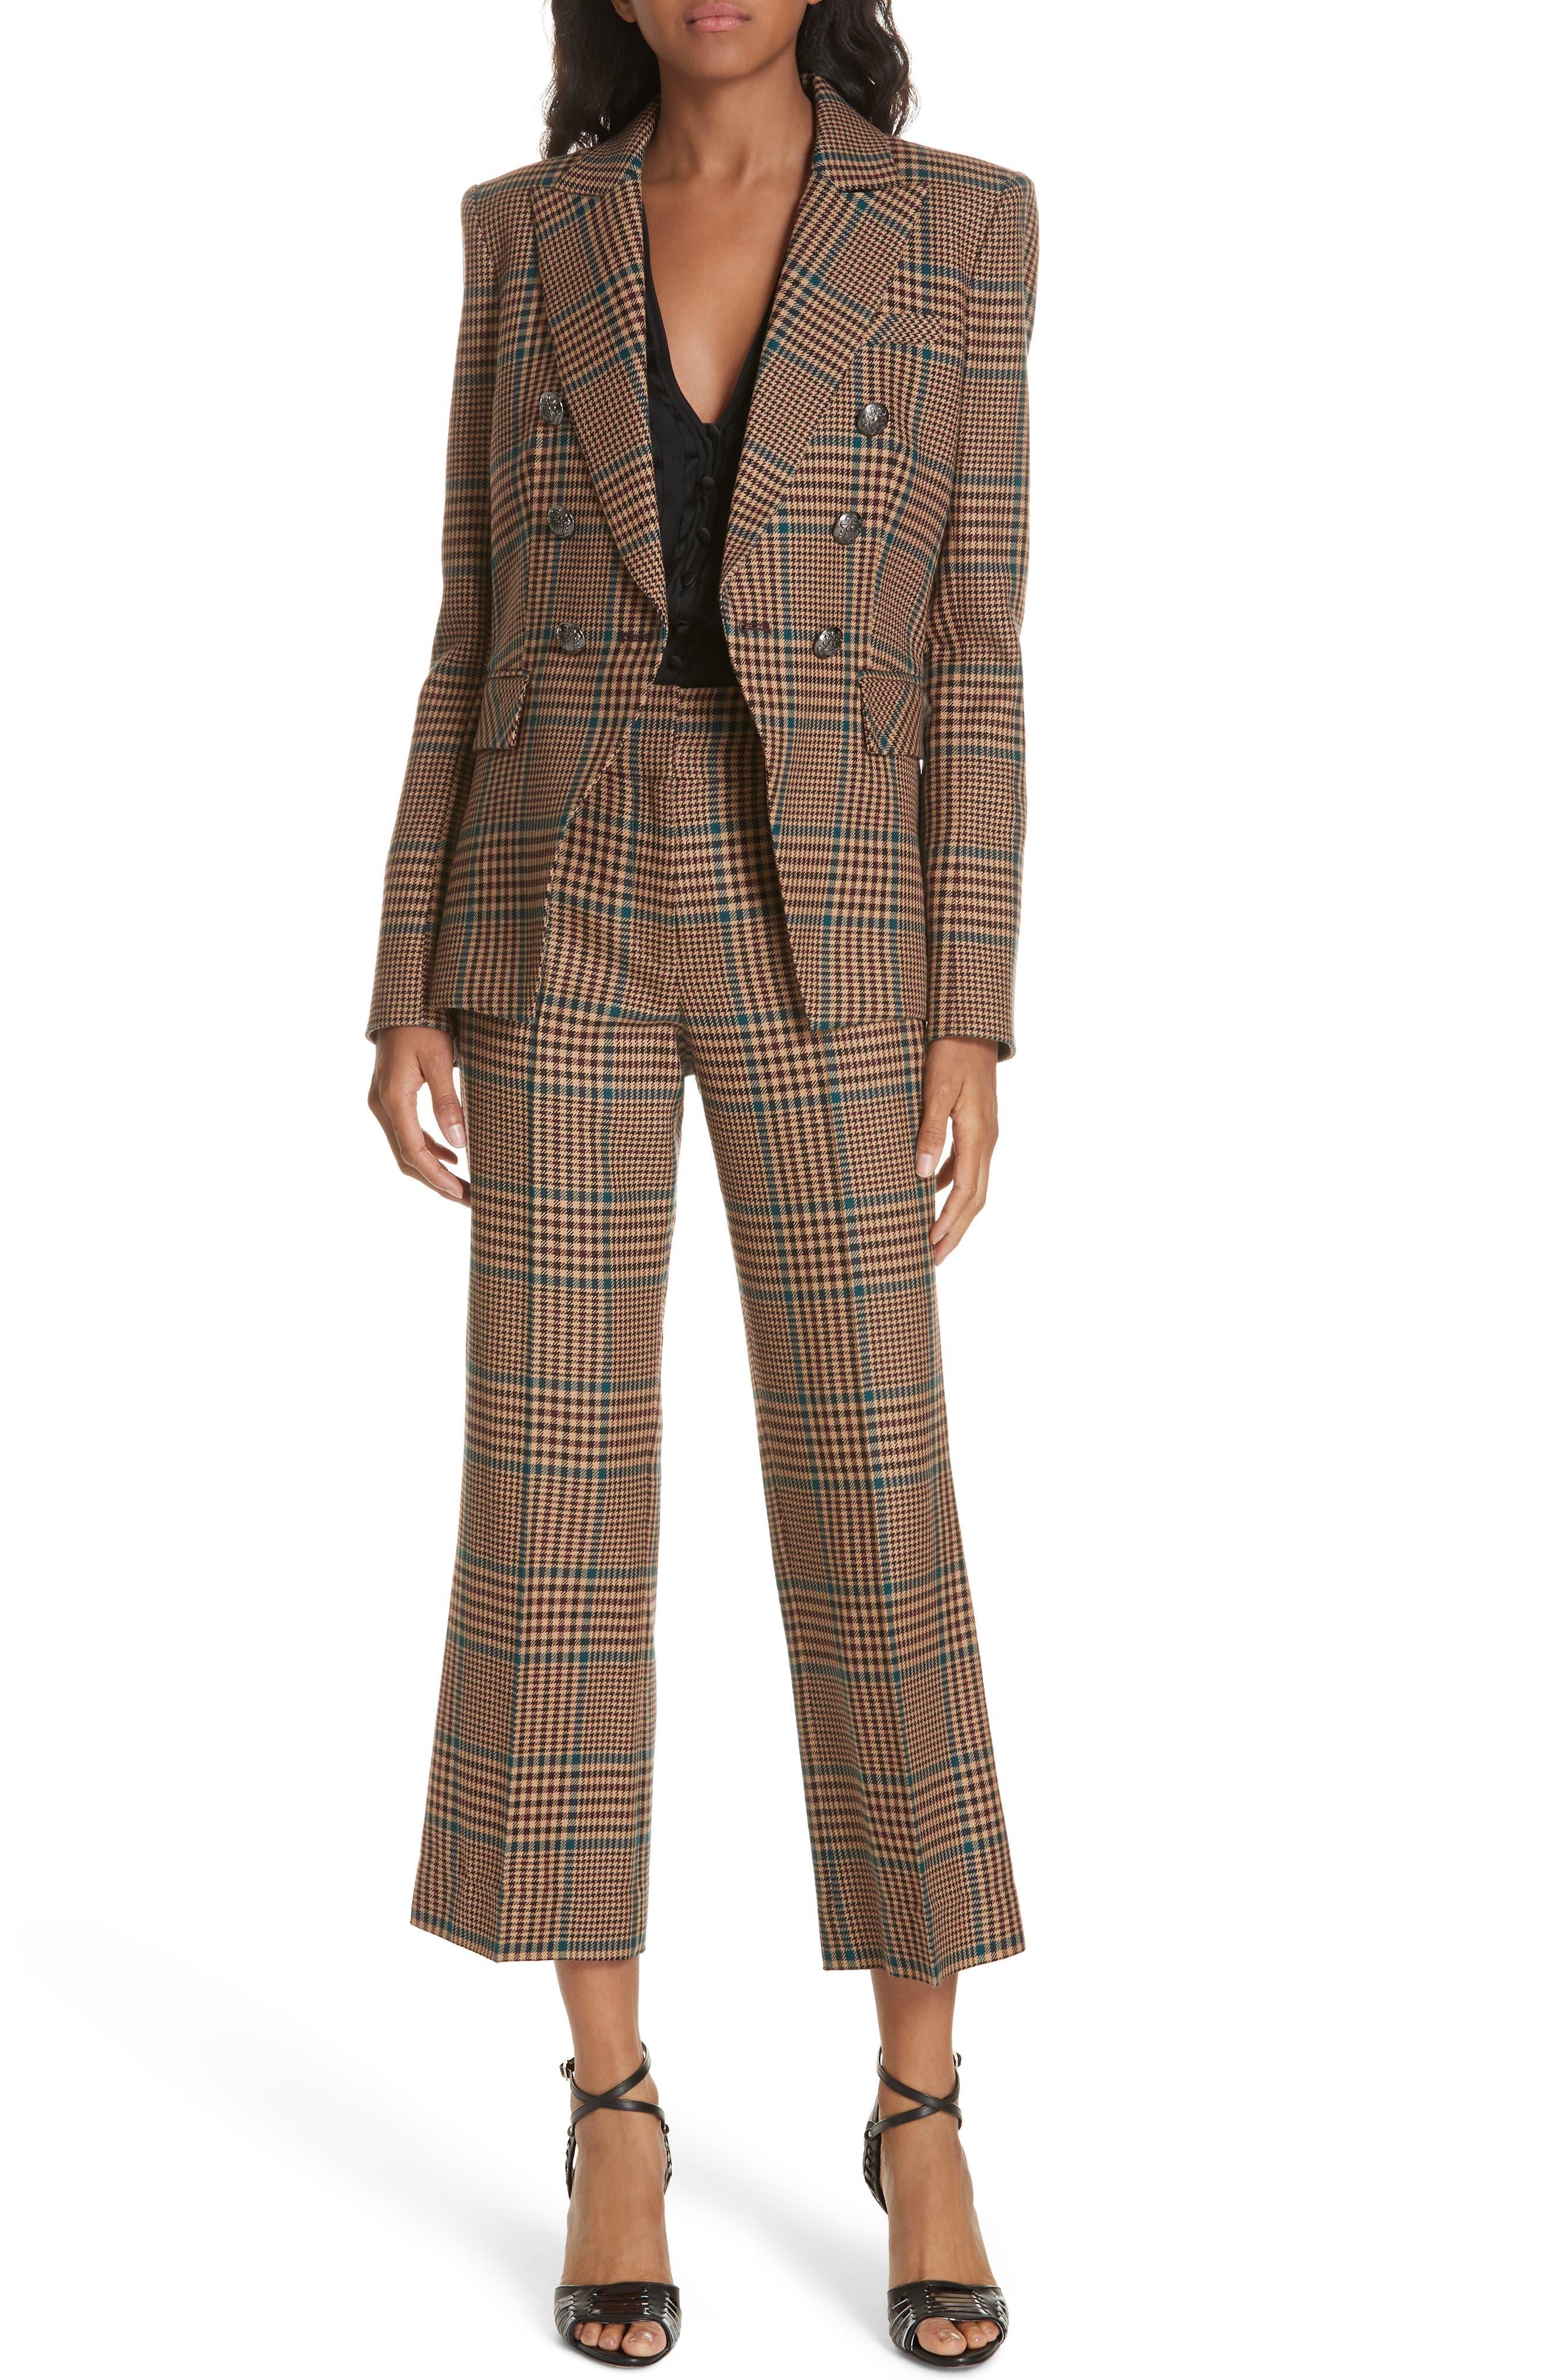 Cormac Plaid Wool Blend Trousers,                             Alternate thumbnail 7, color,                             230